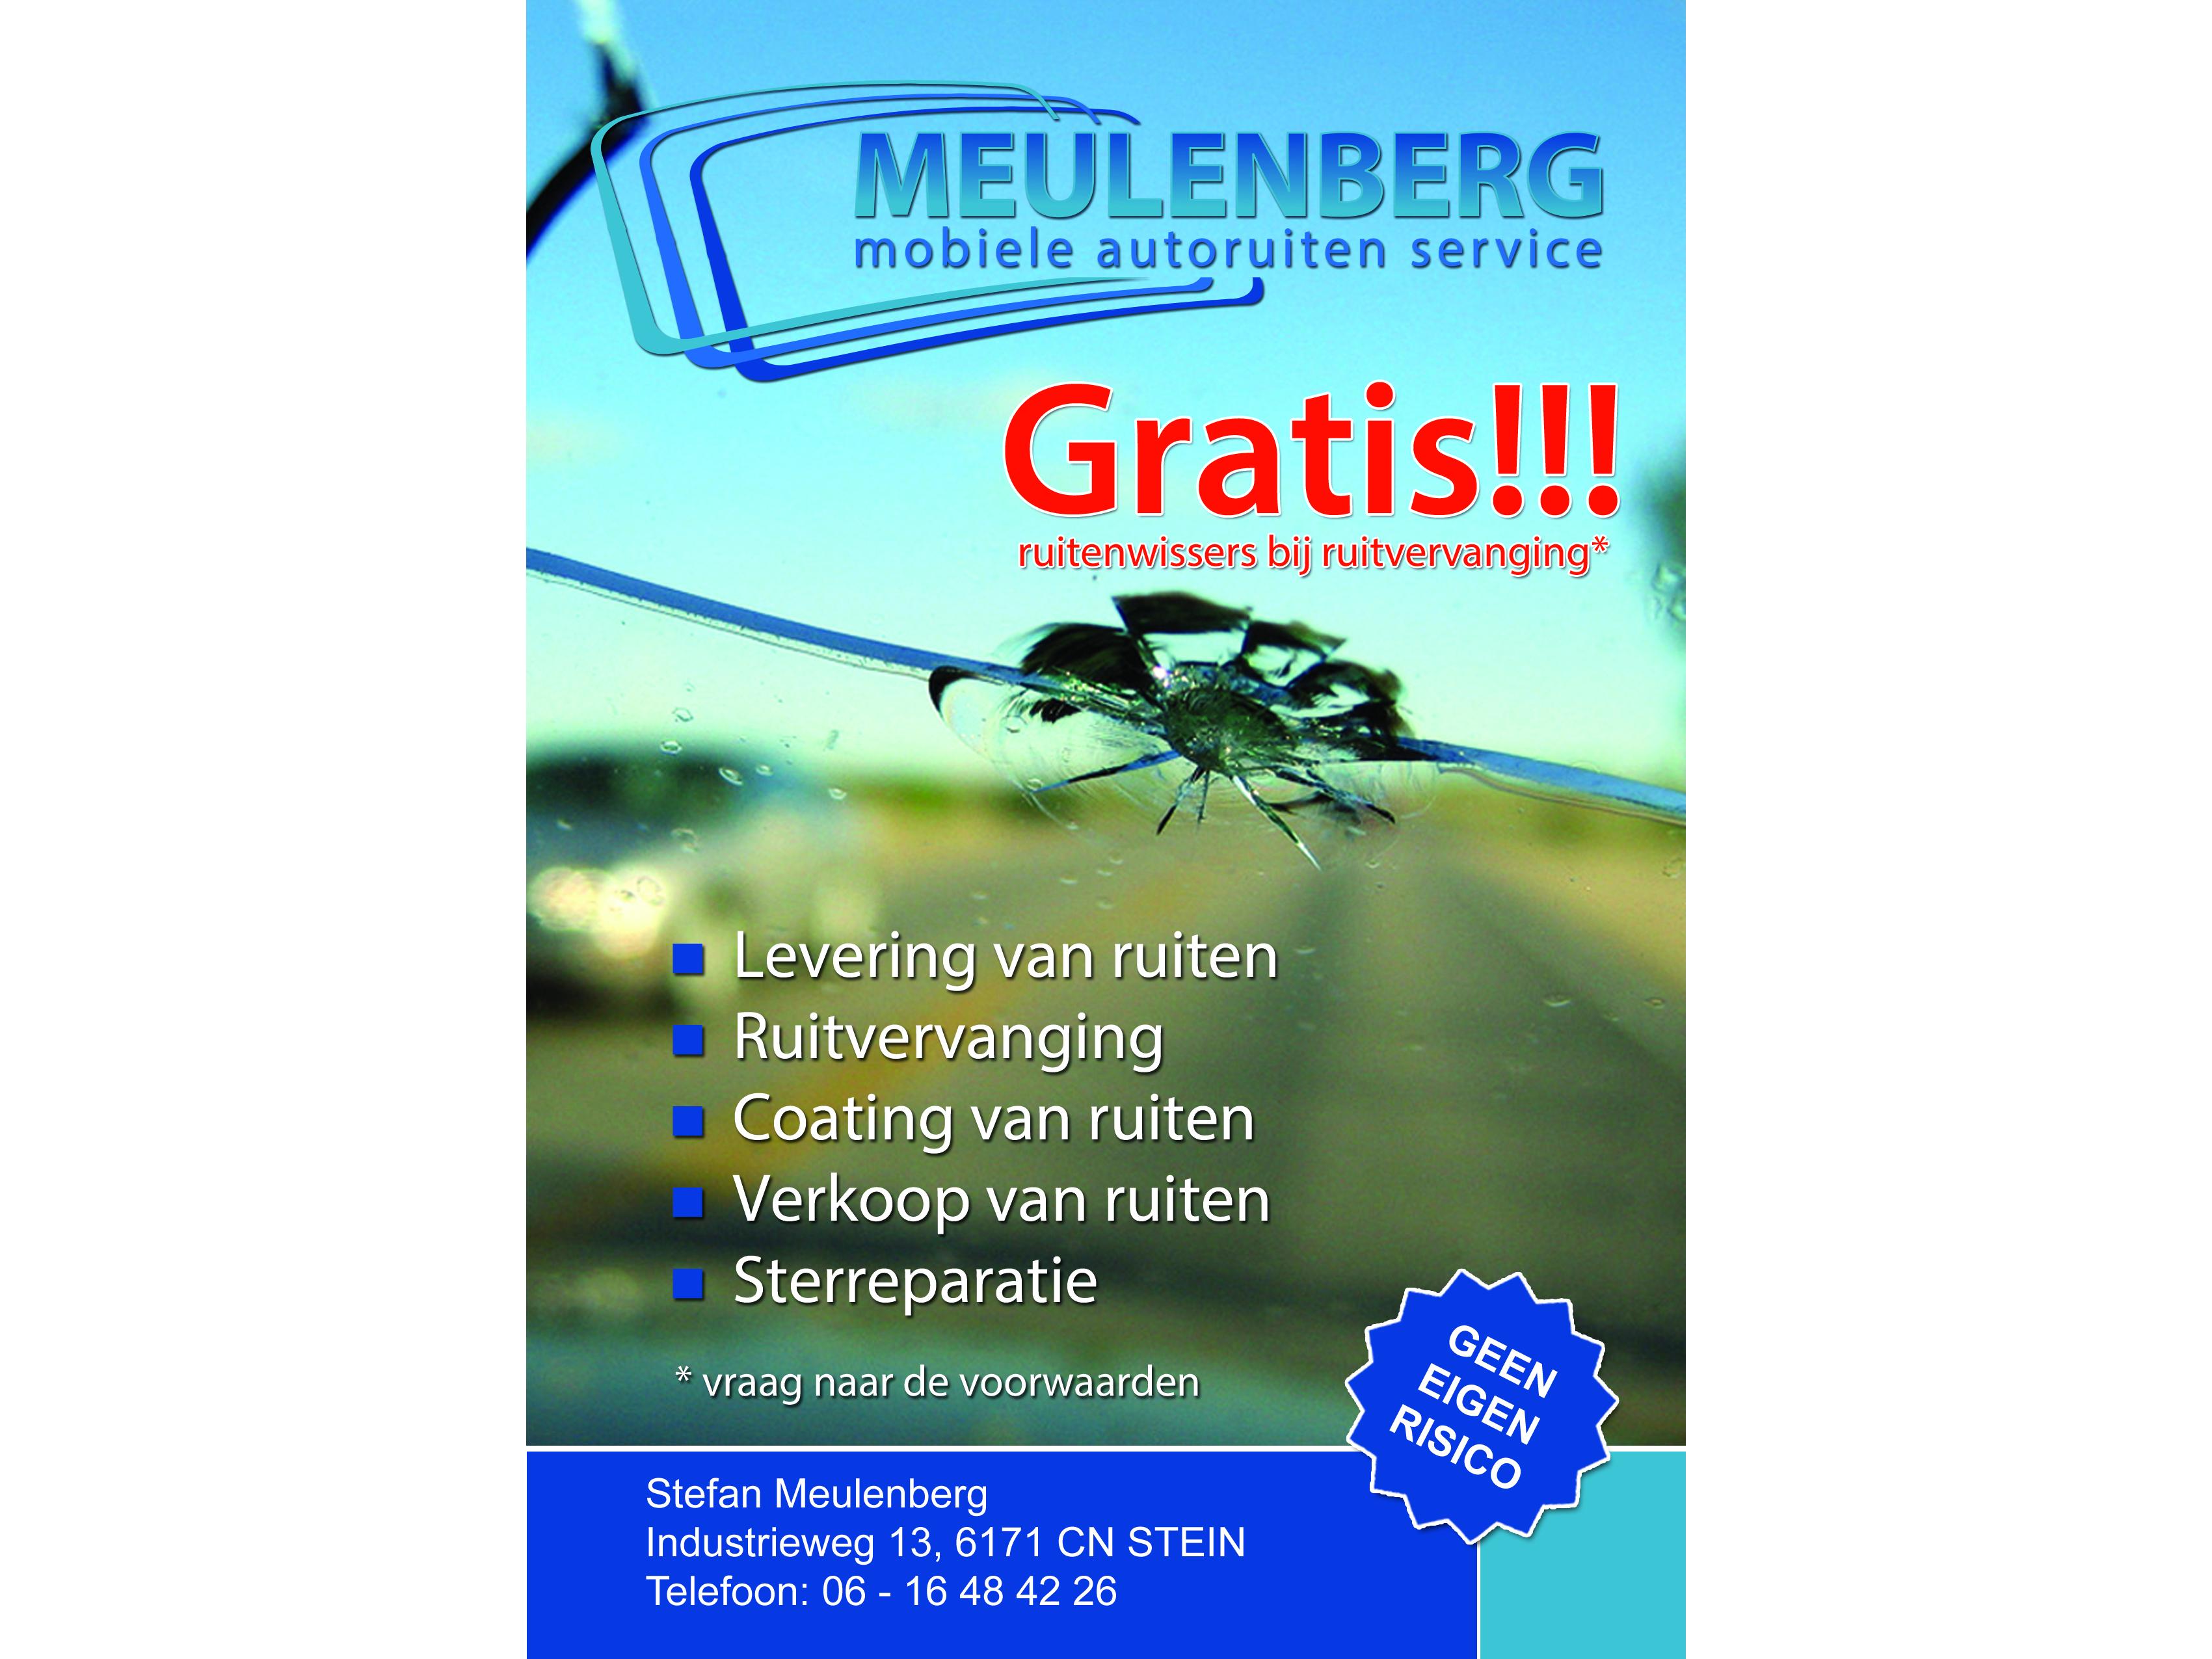 Meulenberg Autoruitenservice